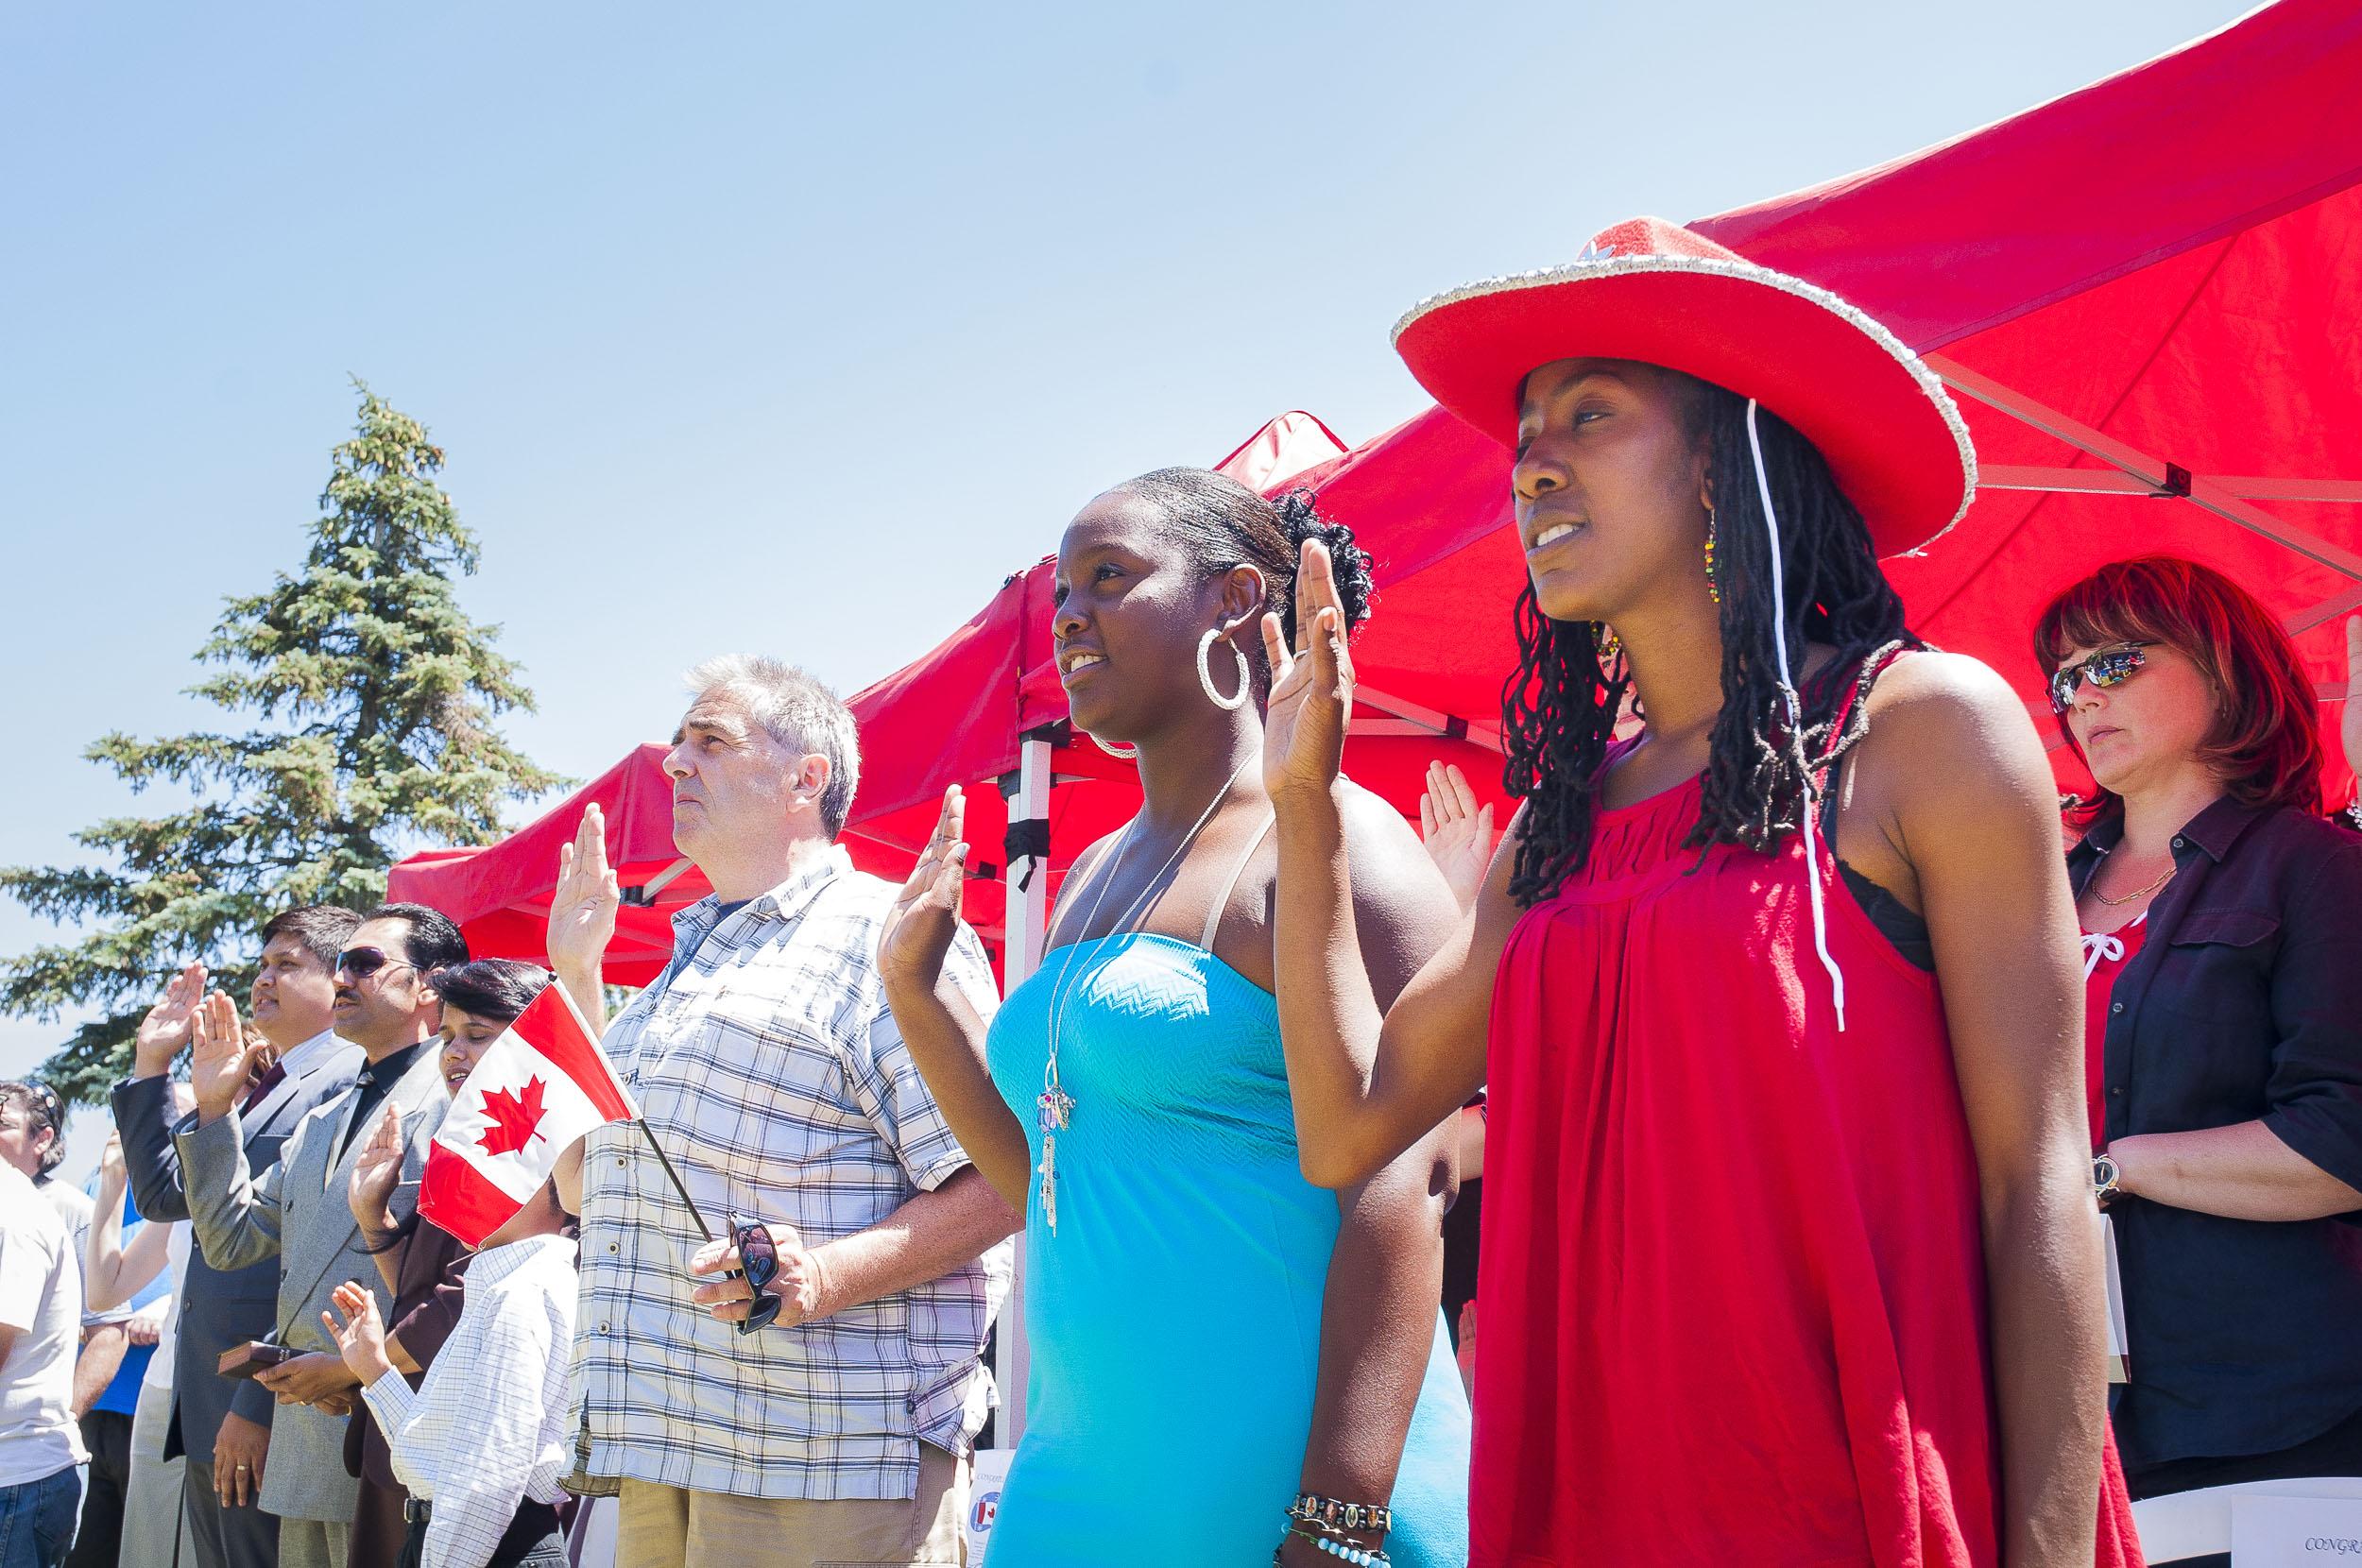 Canadian Citizenship Ceremony-Ribfest -742279915.jpg